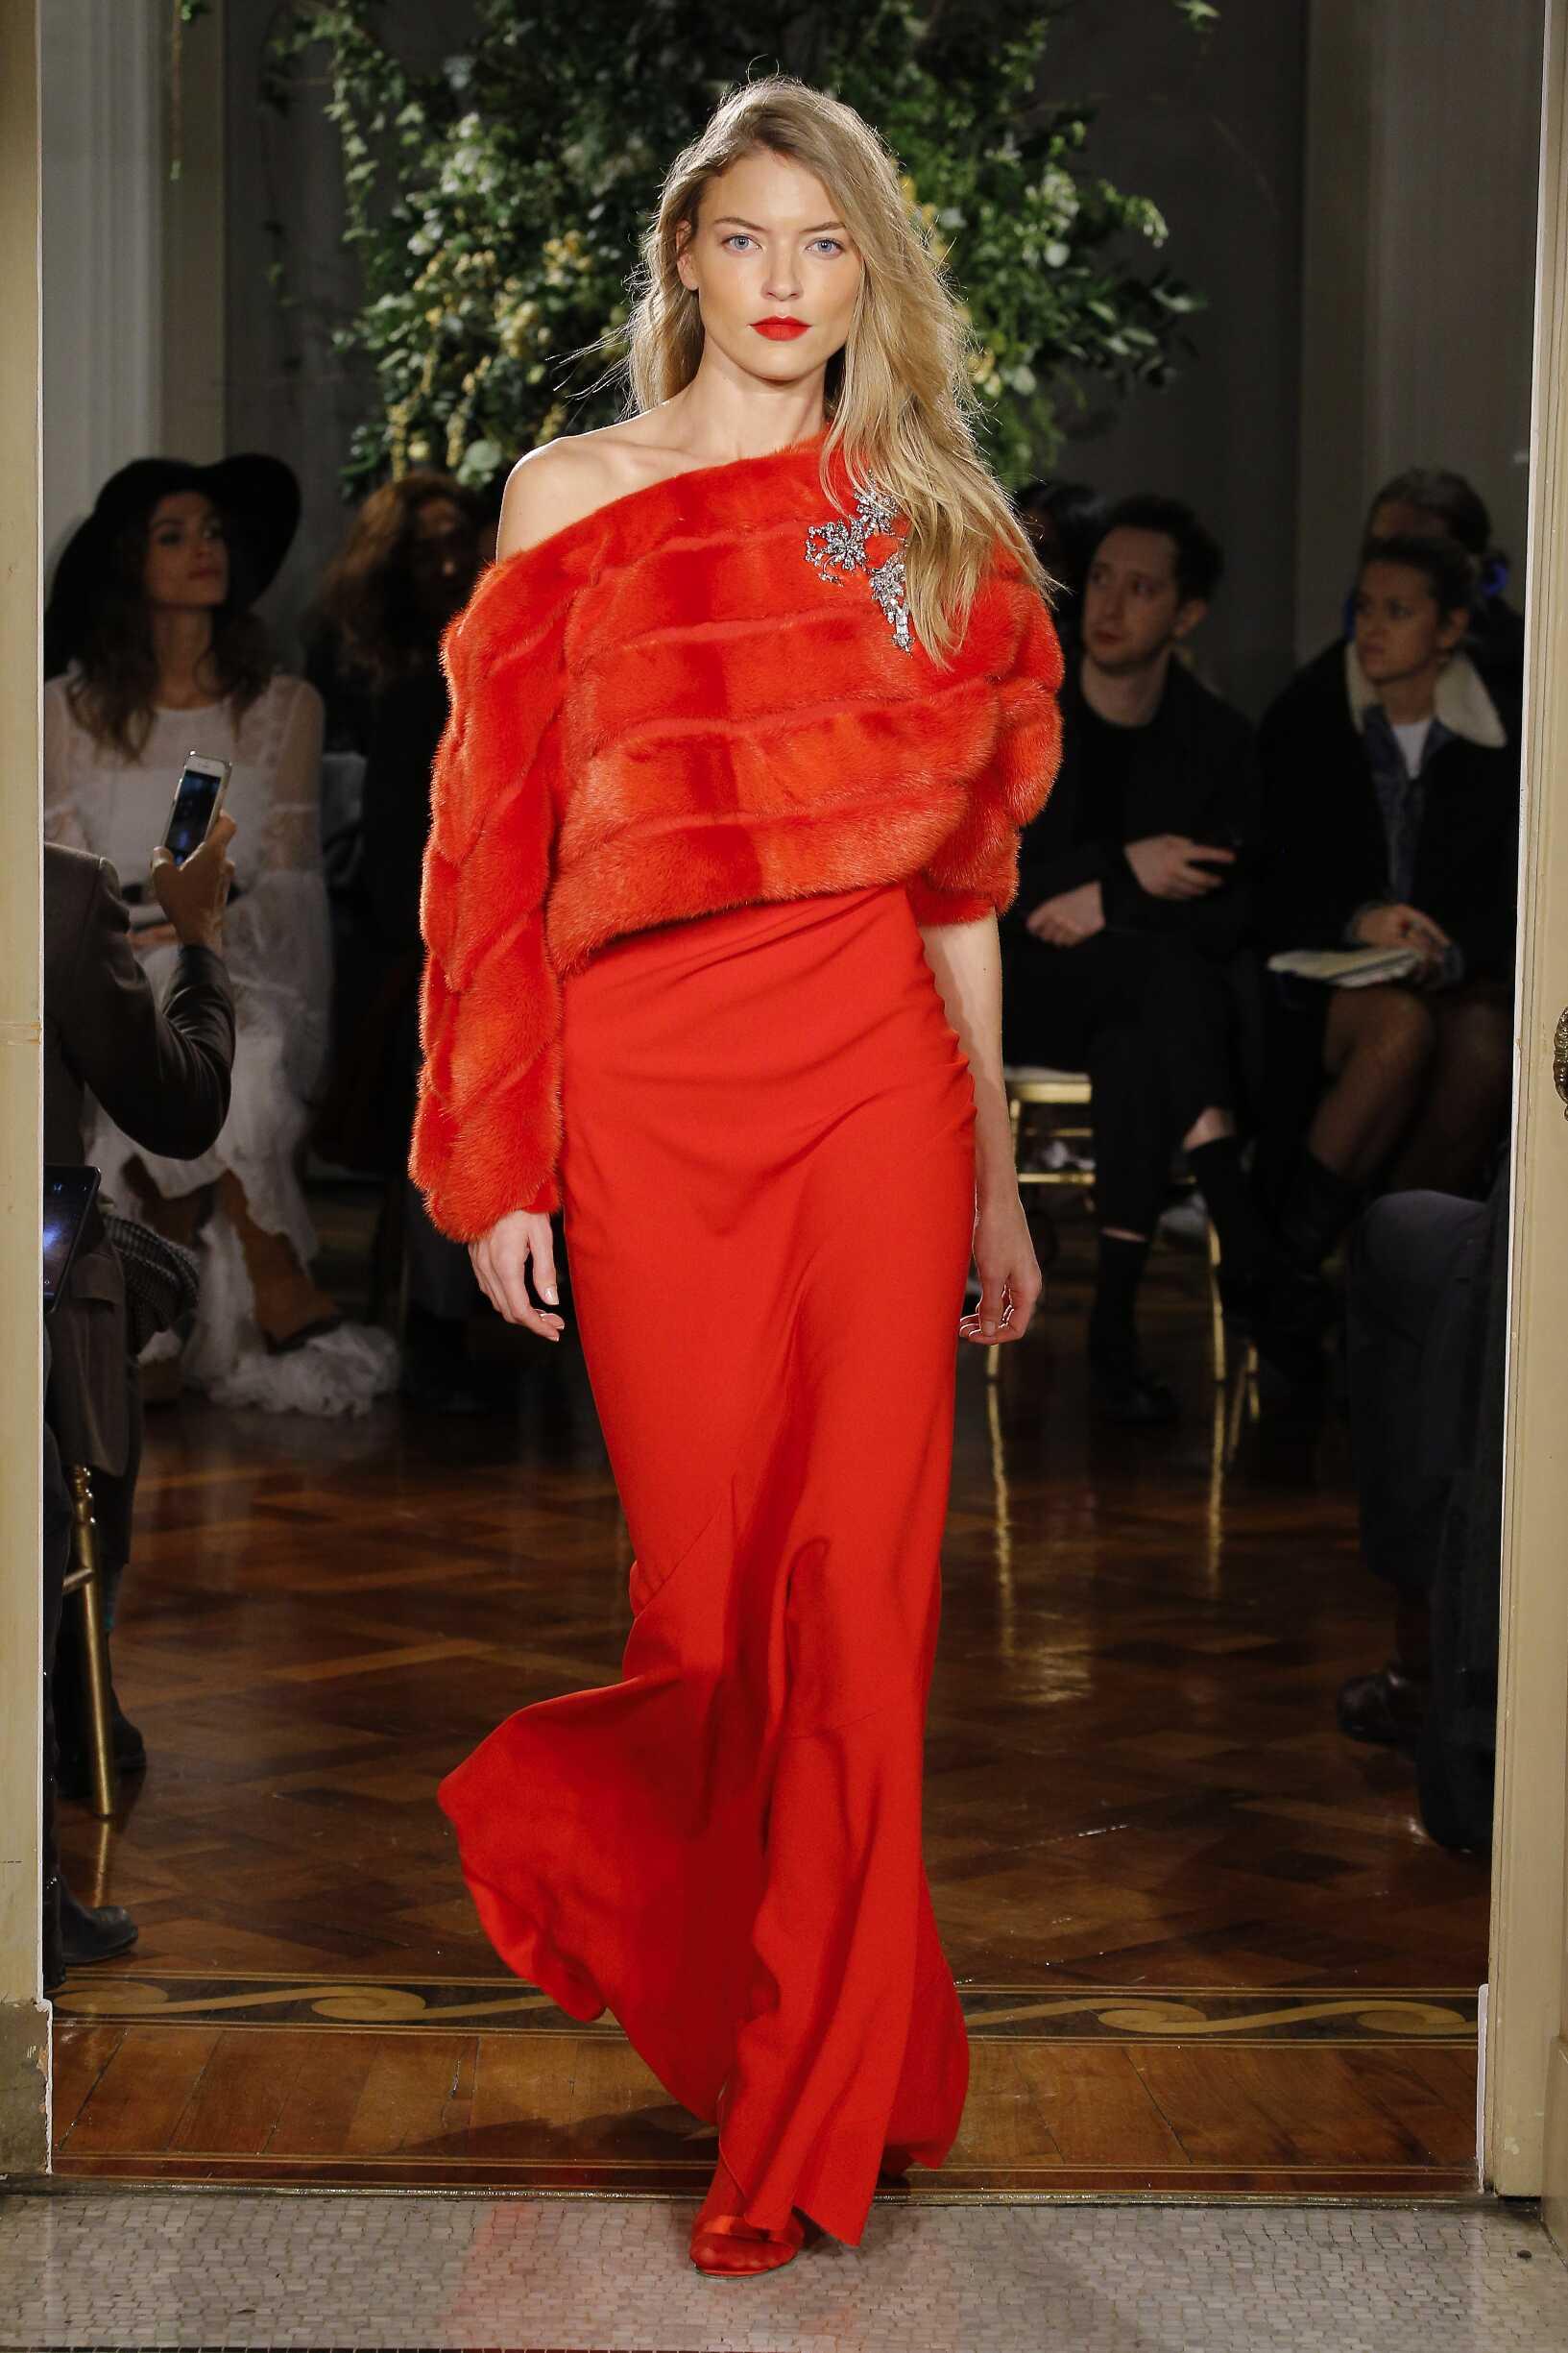 Fashion Woman Model Alberta Ferretti Limited Edition Catwalk 17-18